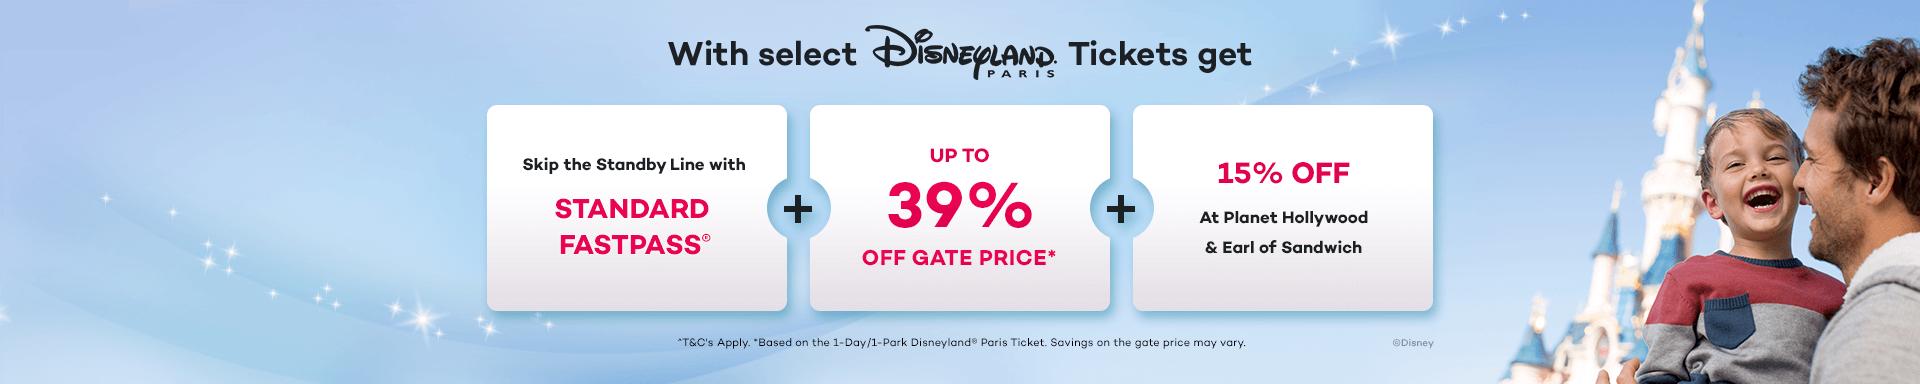 Save up to 39% Off the Gate Price at Disneyland Paris